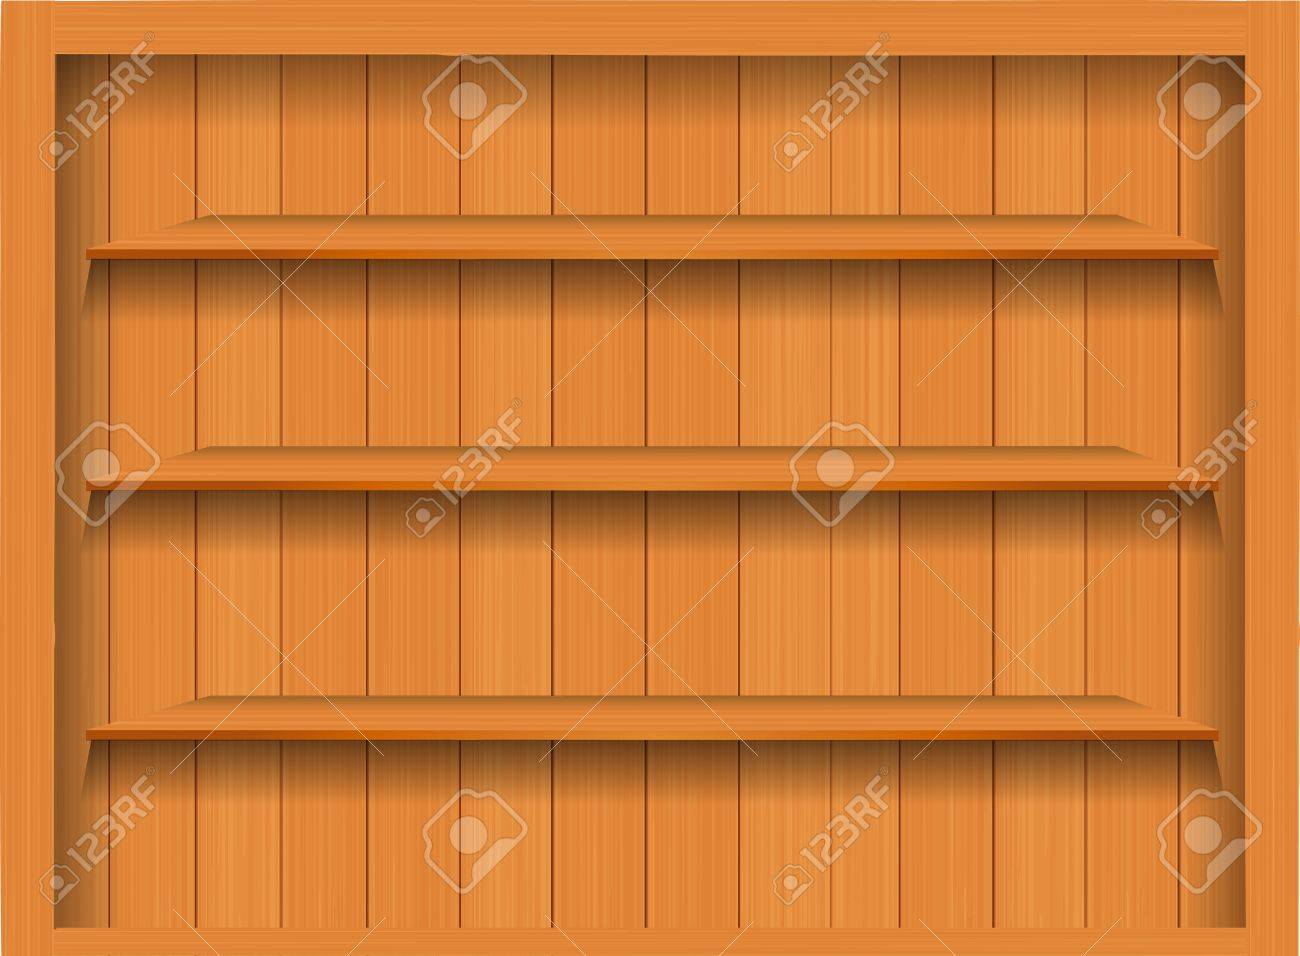 Interior wooden shelves free vector - Vector Vector Empty Wood Shelf Grunge Industrial Interior Uneven Diffuse Lighting Version Design Component